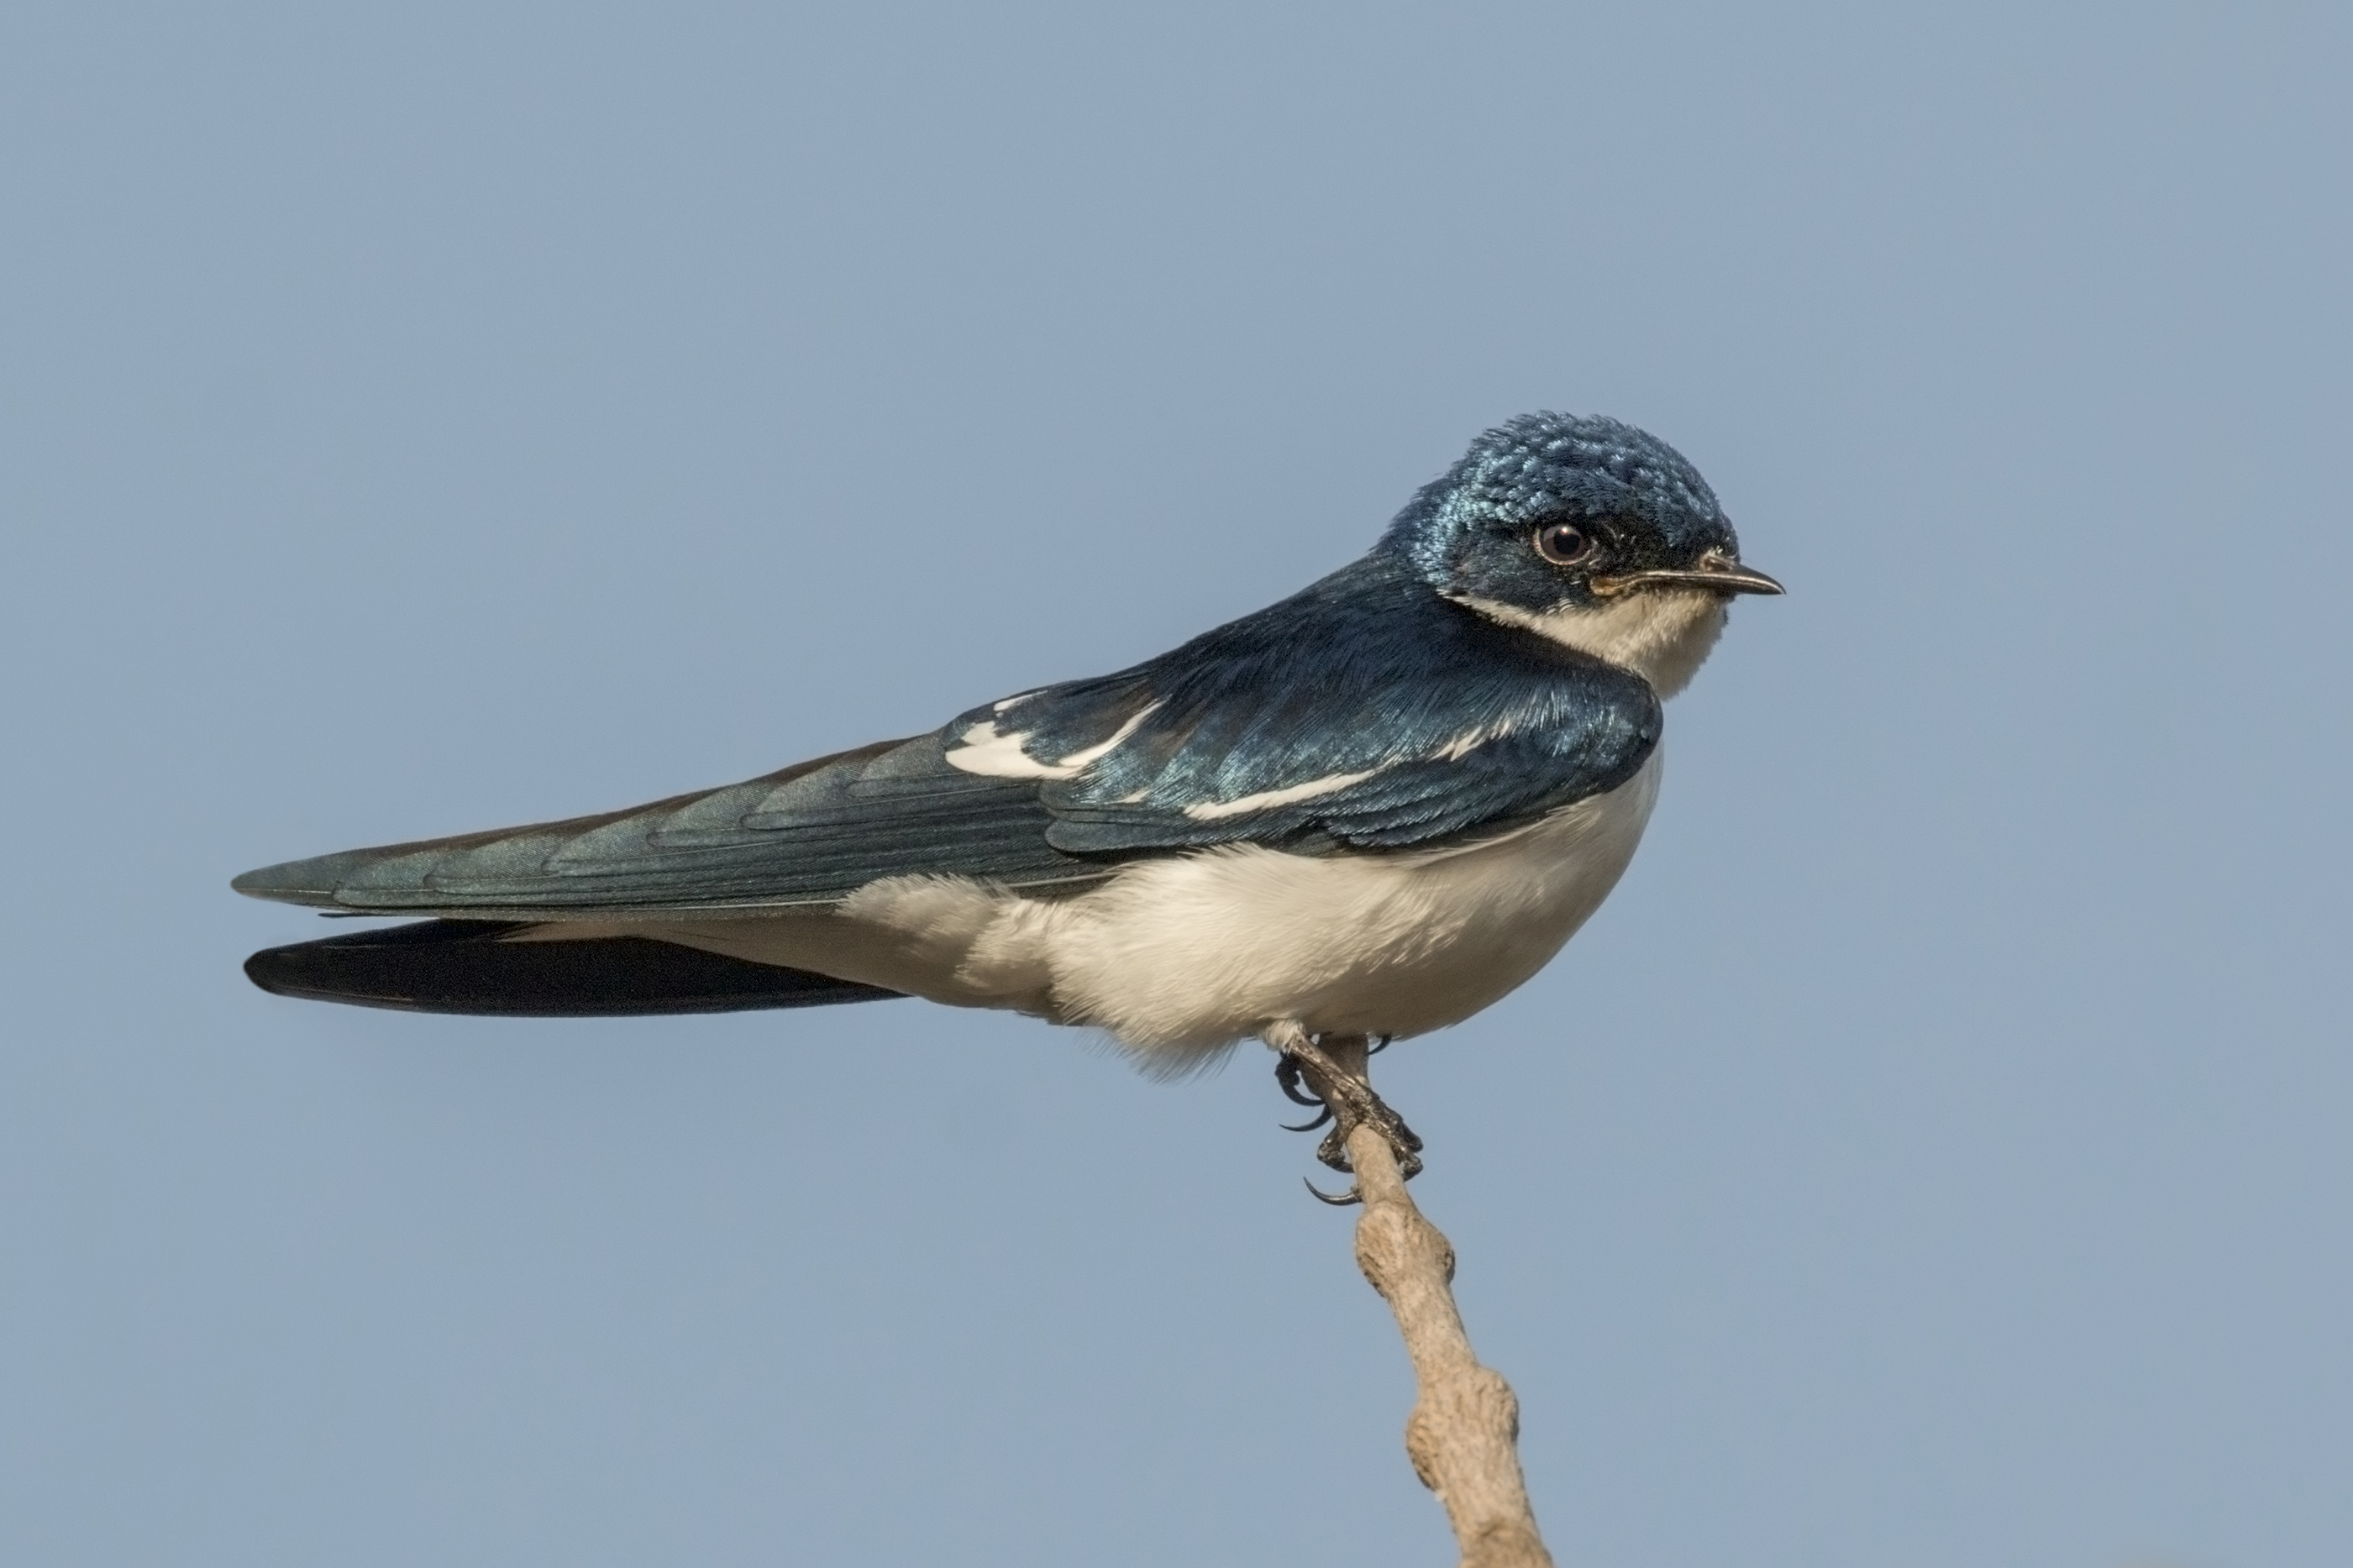 File:Pied-winged swallow (Hirundo leucosoma).jpg - Wikipedia